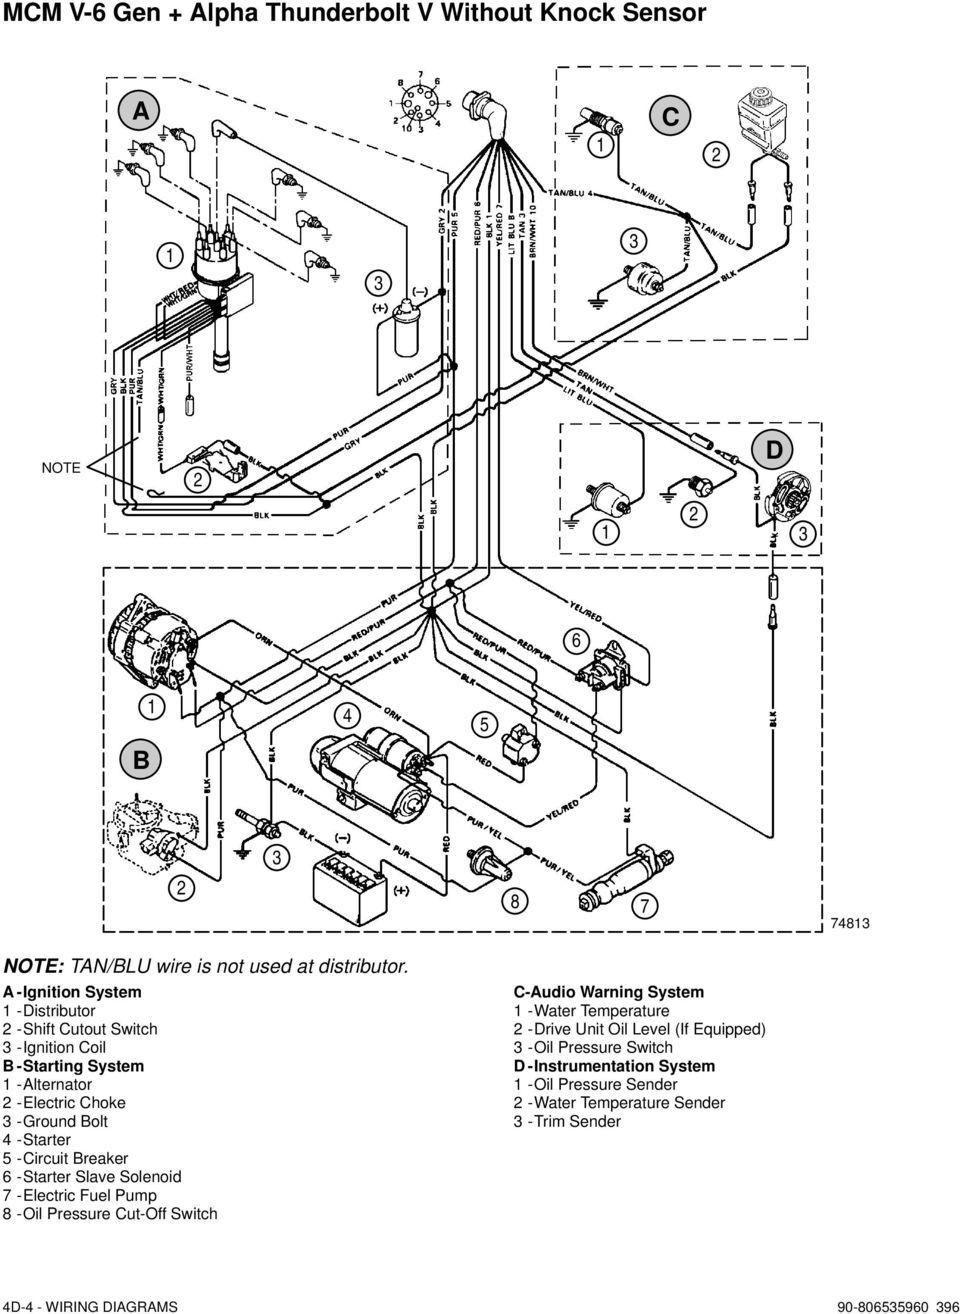 medium resolution of  ircuit reaker starter slave solenoid 7 electric fuel pump 8 oil pressure